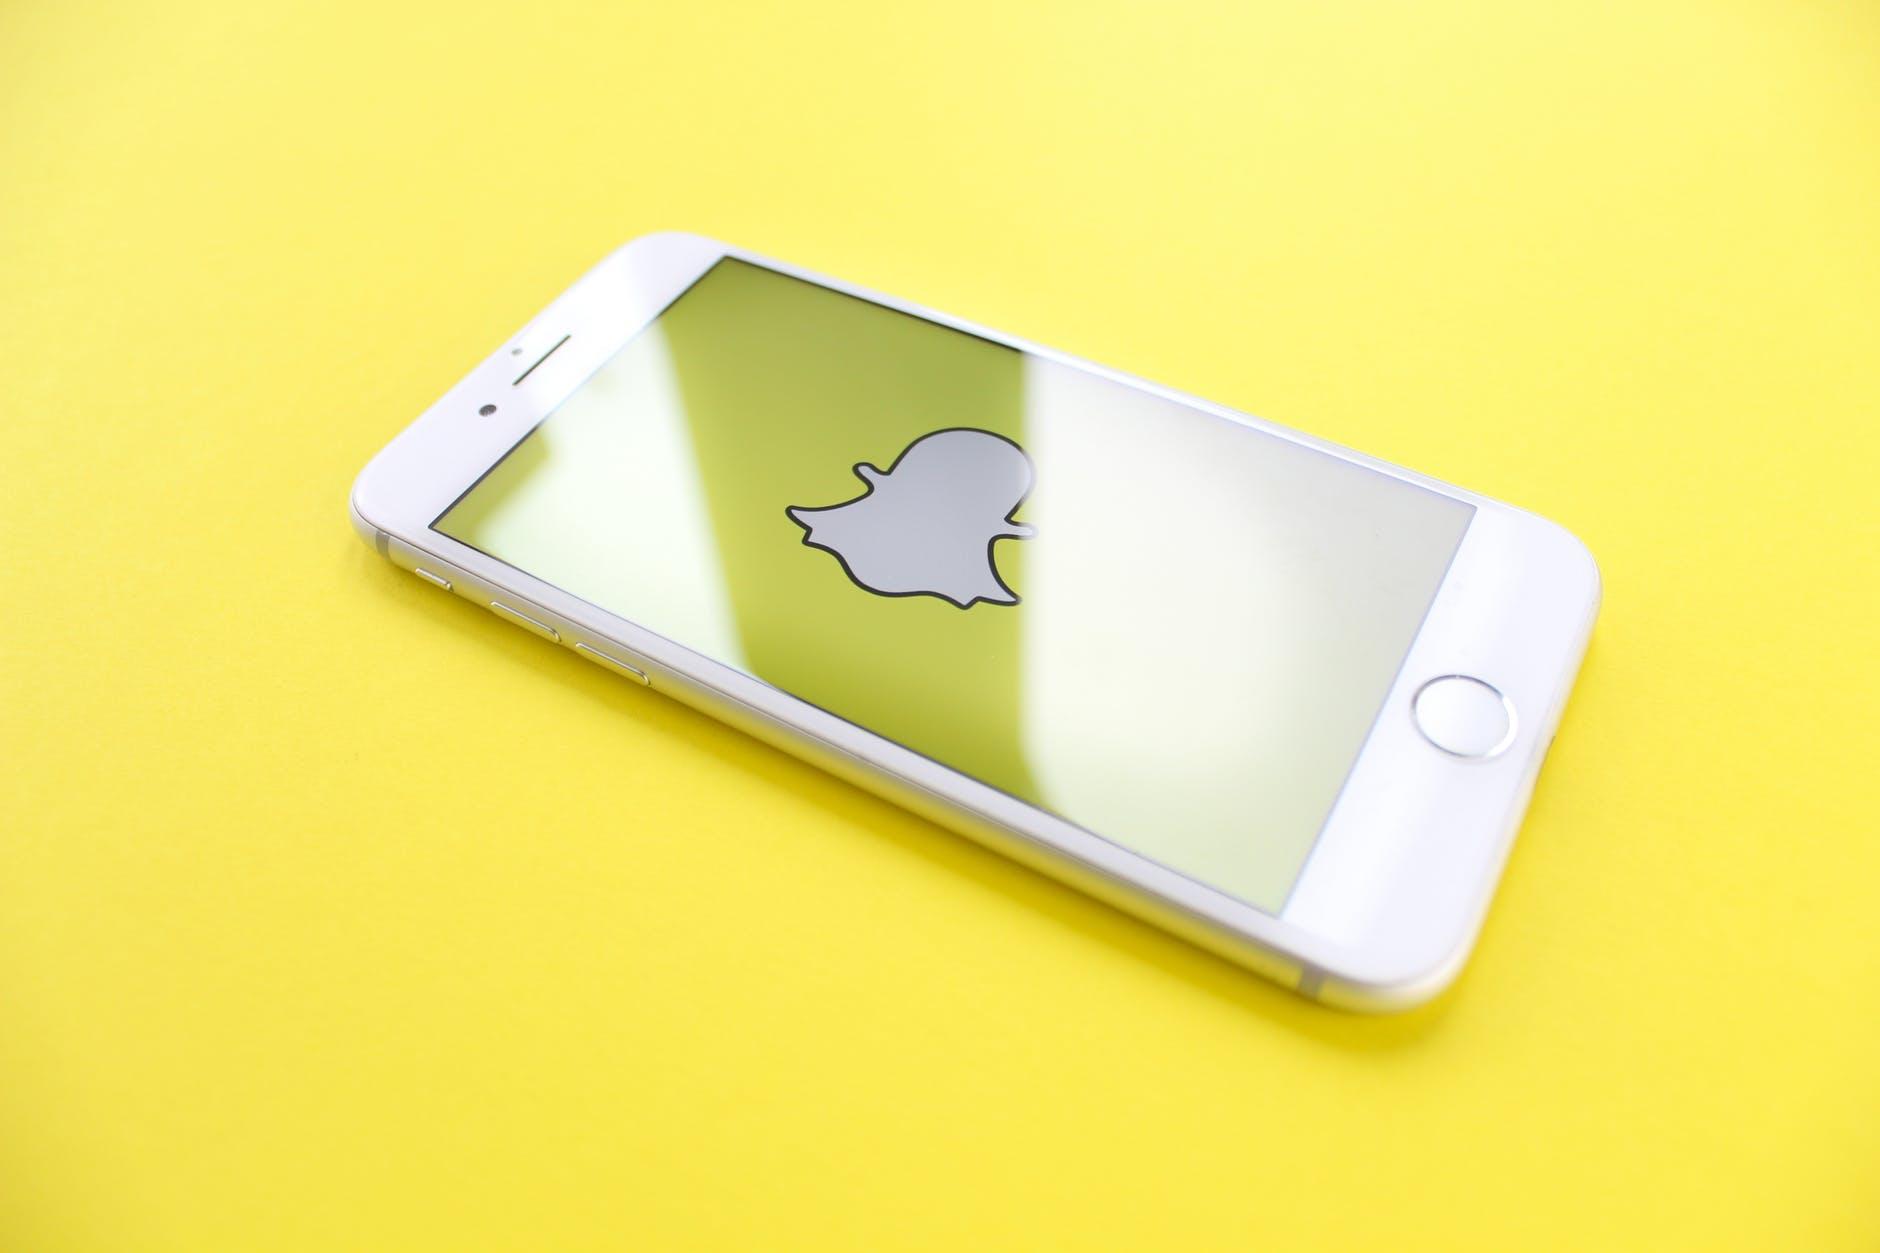 Descopera cum poti face bani din videochat cu Snapchat! Ghid complet